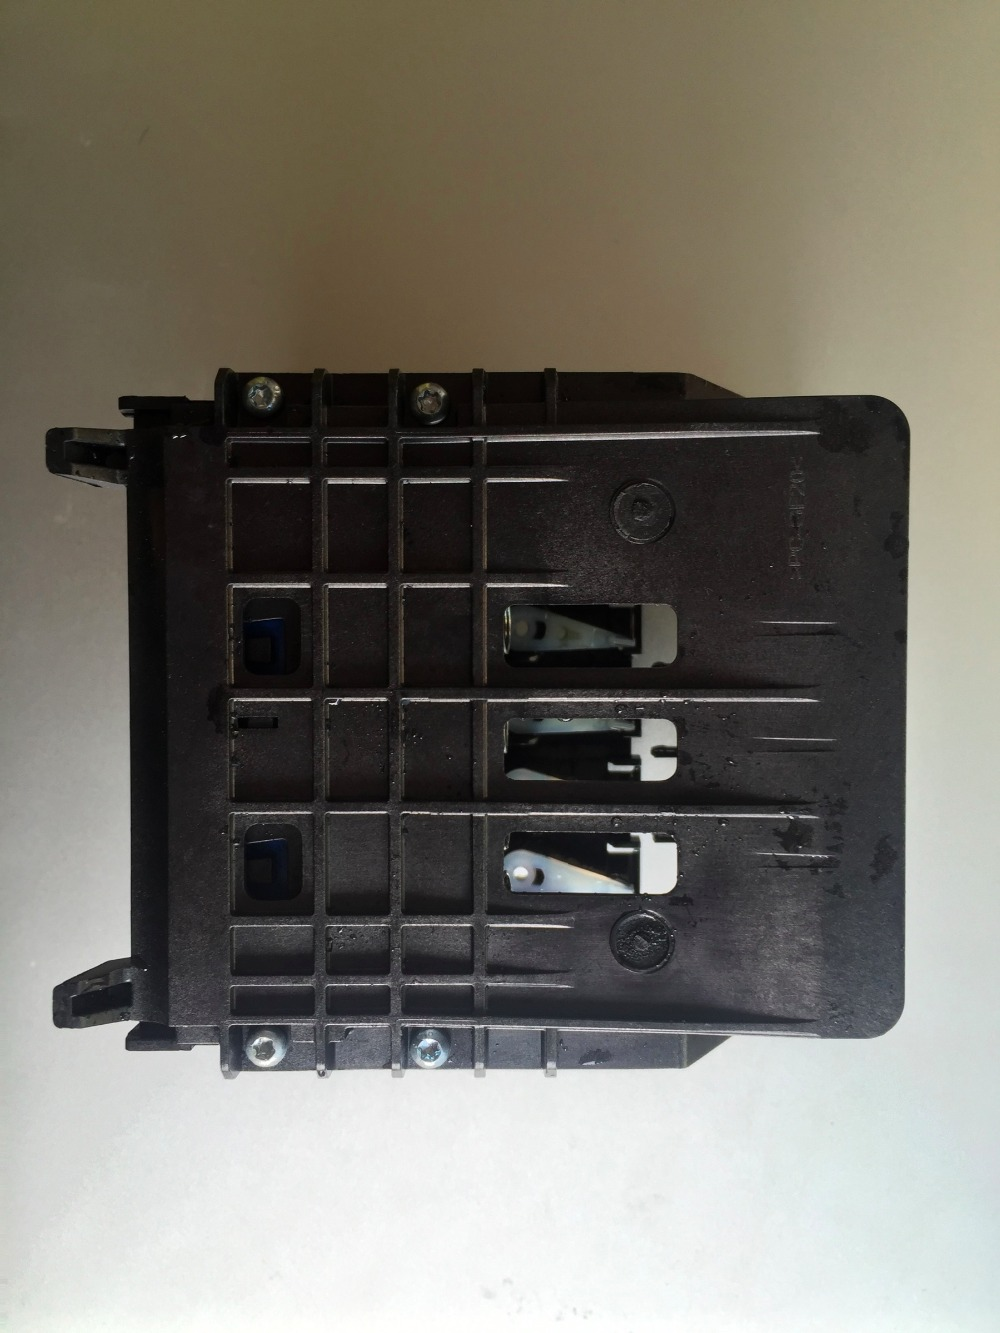 Genuino RISTRUTTURATO testina di stampa per stampanti HP 950 PRO 8100 PRO8600 testina di stampaGenuino RISTRUTTURATO testina di stampa per stampanti HP 950 PRO 8100 PRO8600 testina di stampa